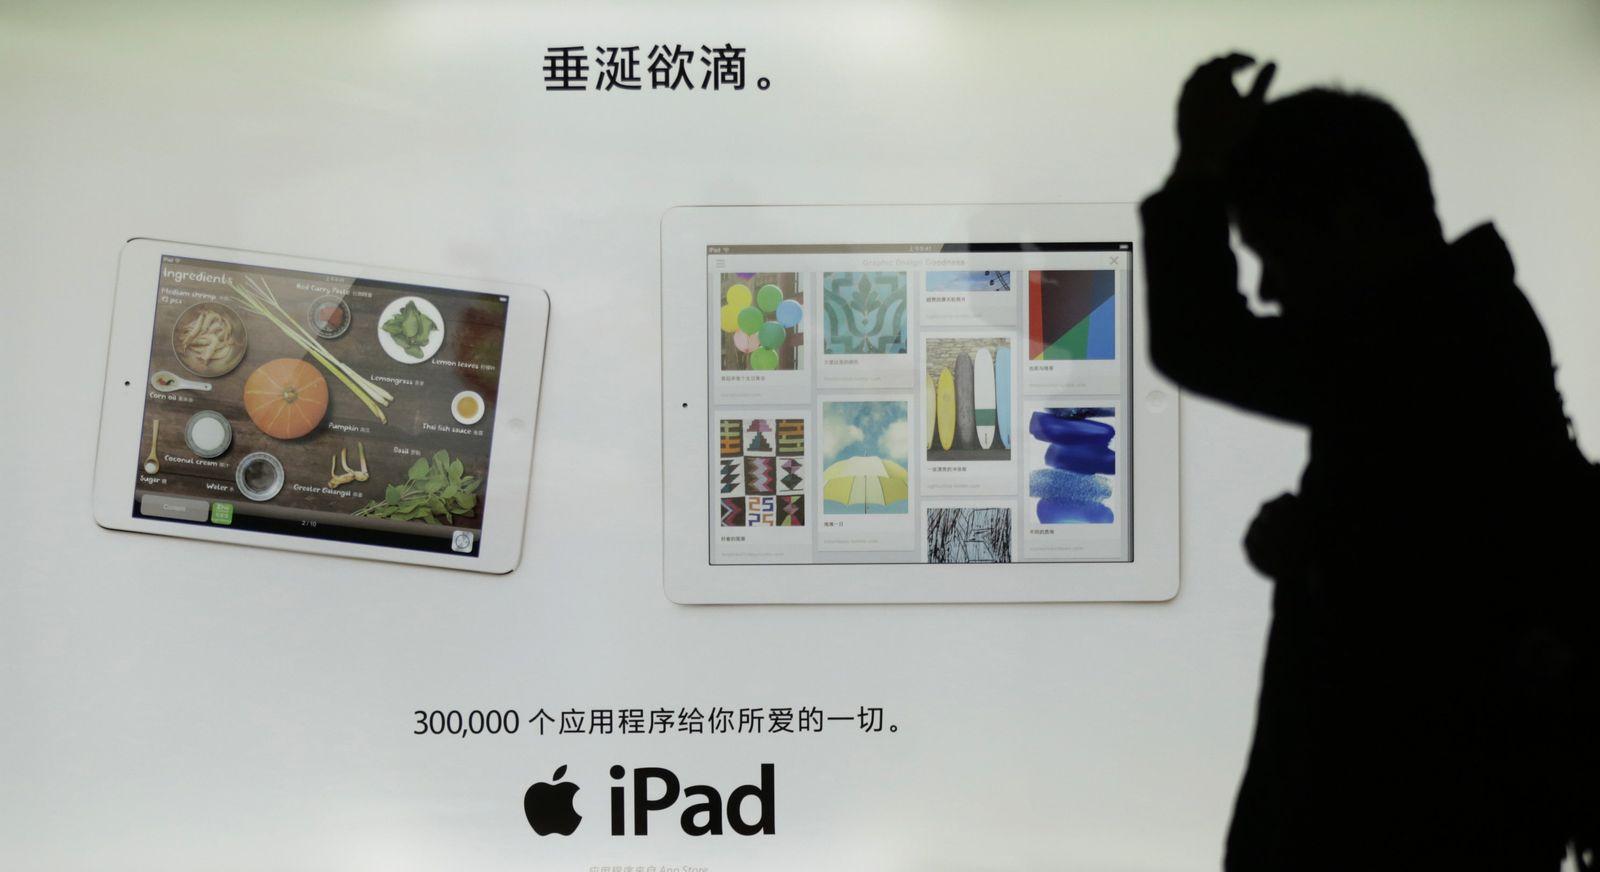 China Attacking Apple